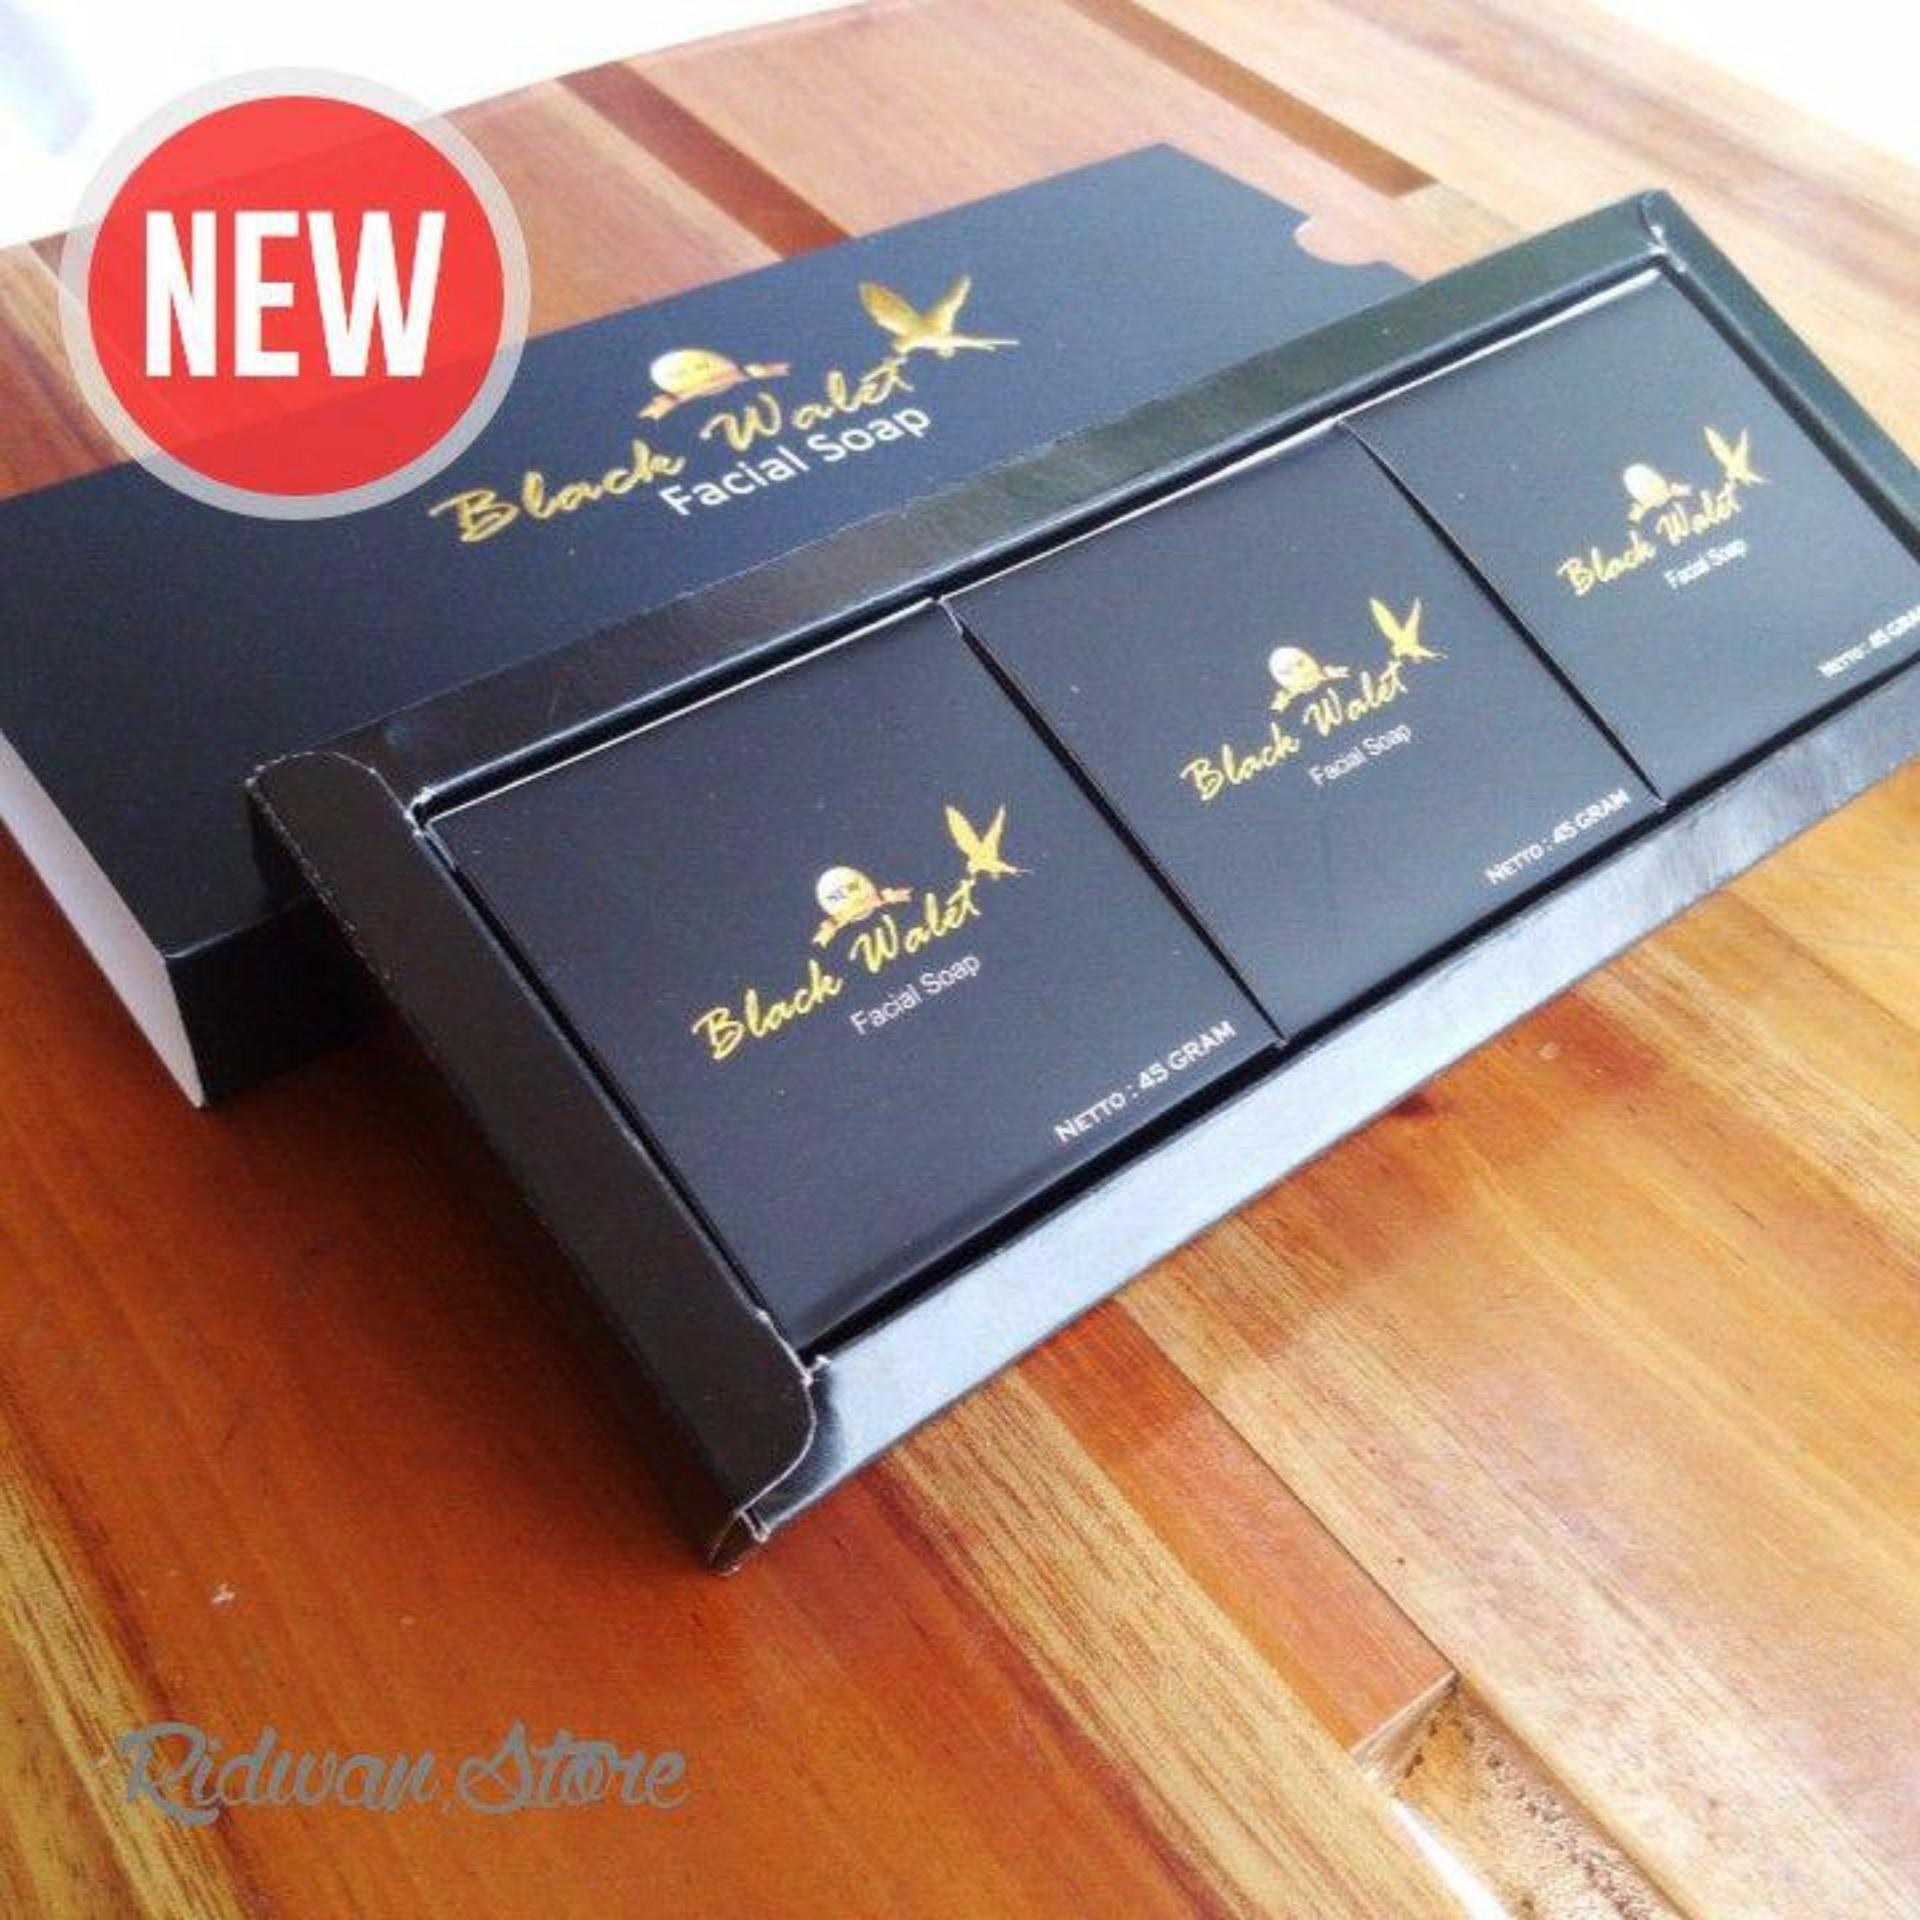 Spesifikasi Sabun New Black Walet Asli Isi 3 Pcs Merk New Black Walet